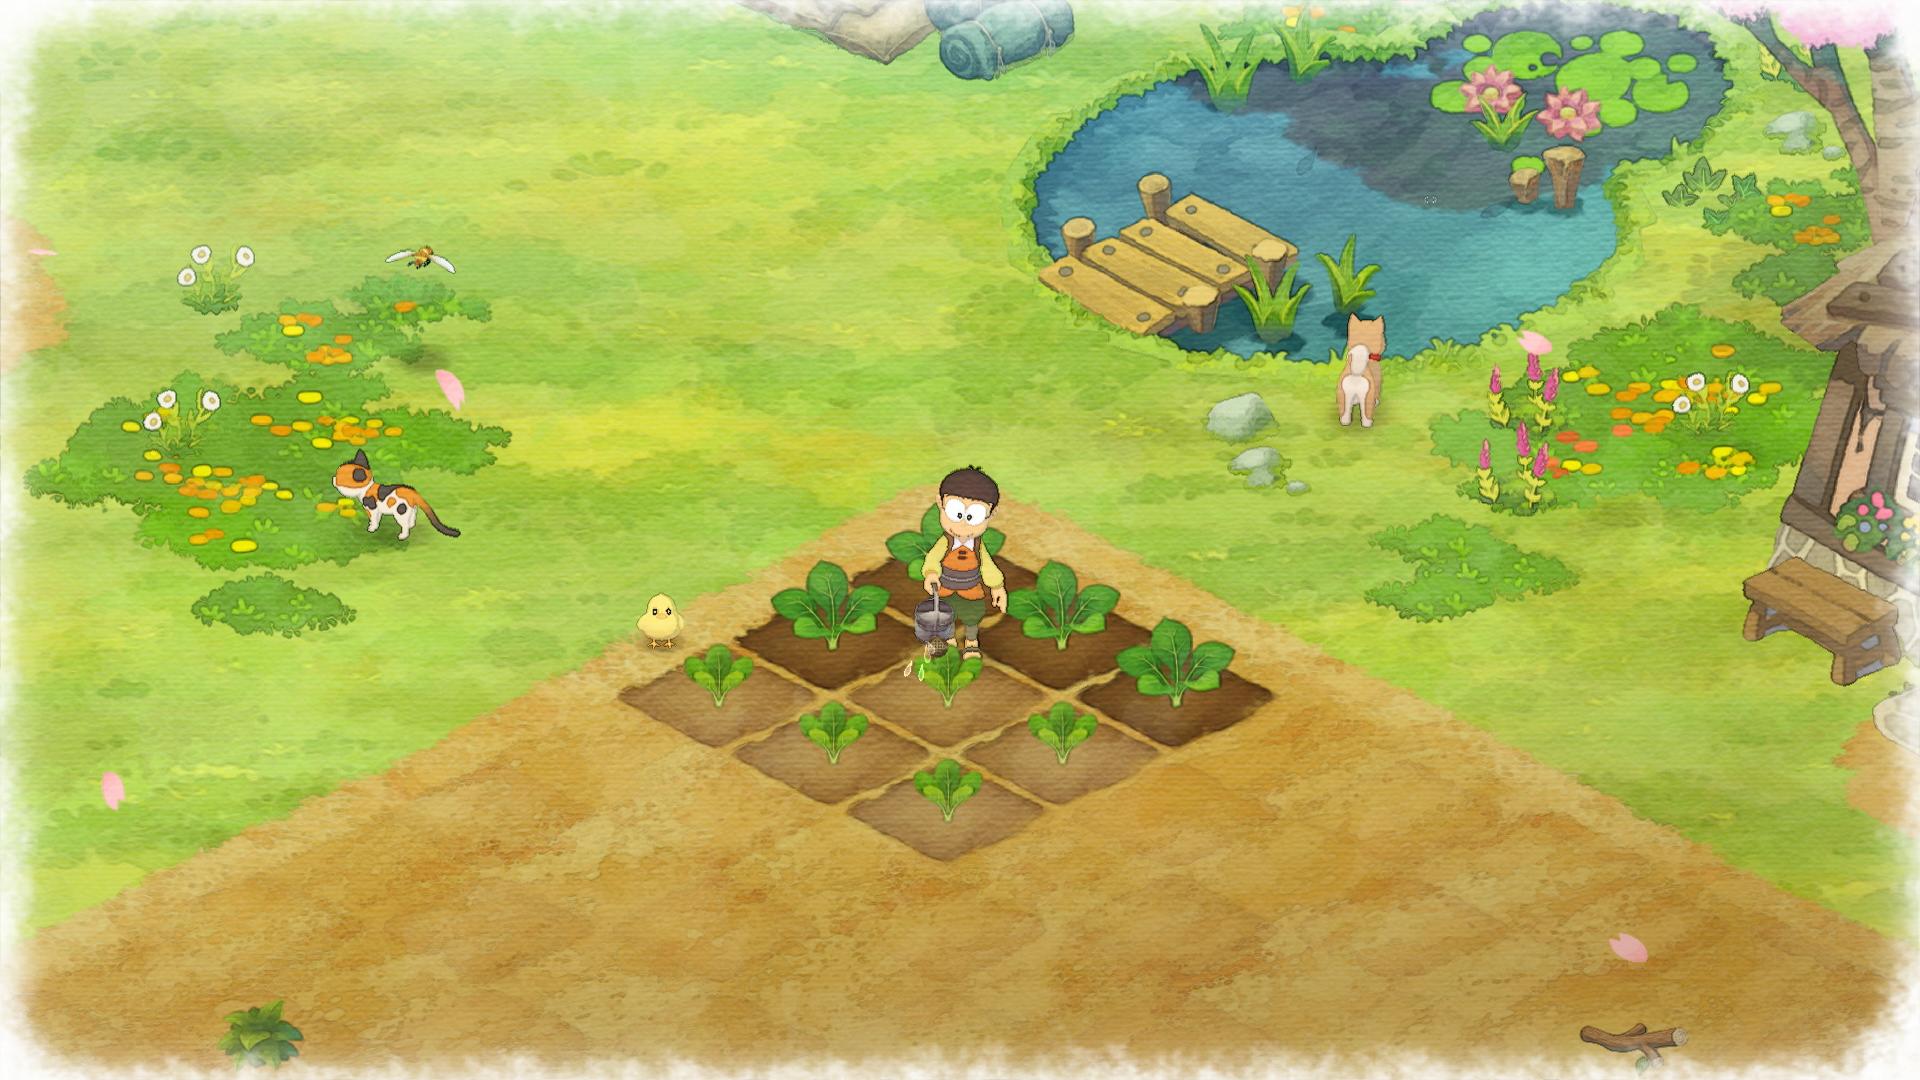 Doraemon_watering_plant_1556028532.png